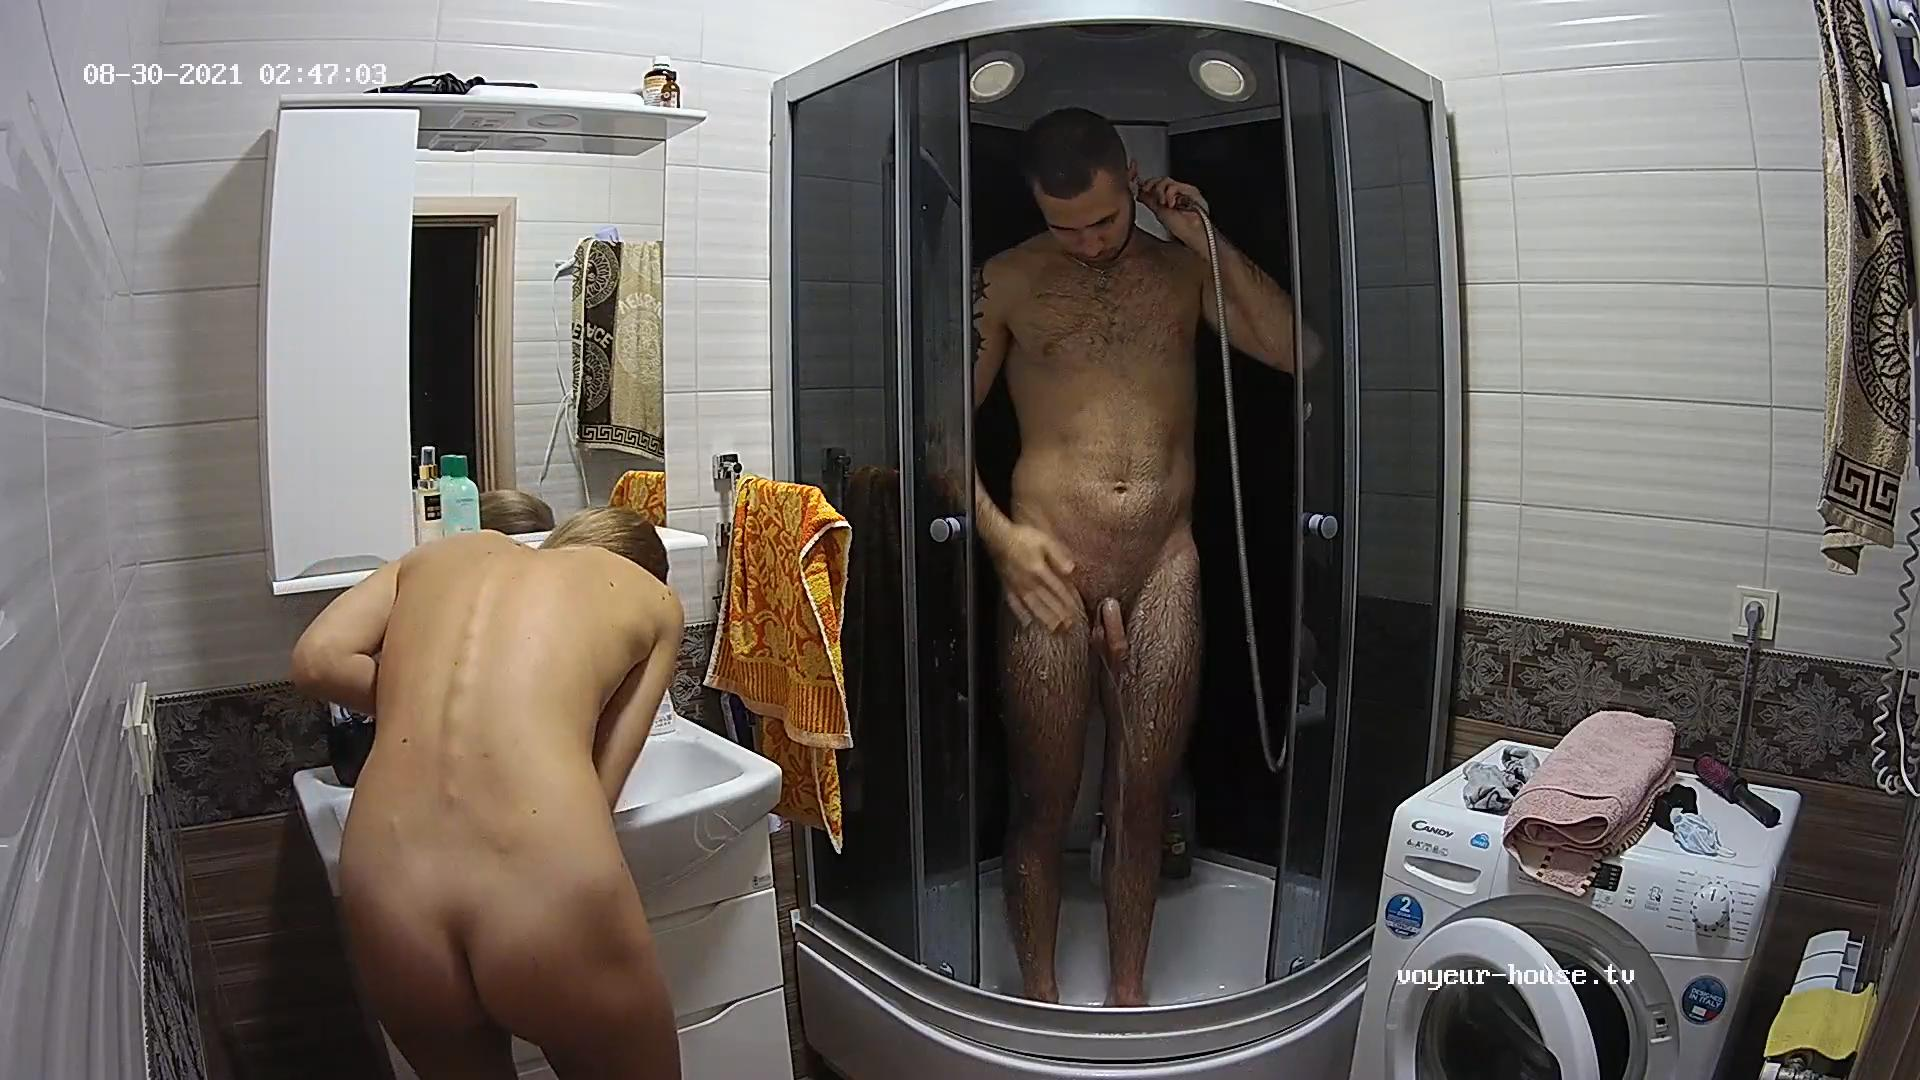 Lucas shower 30 Aug 2021